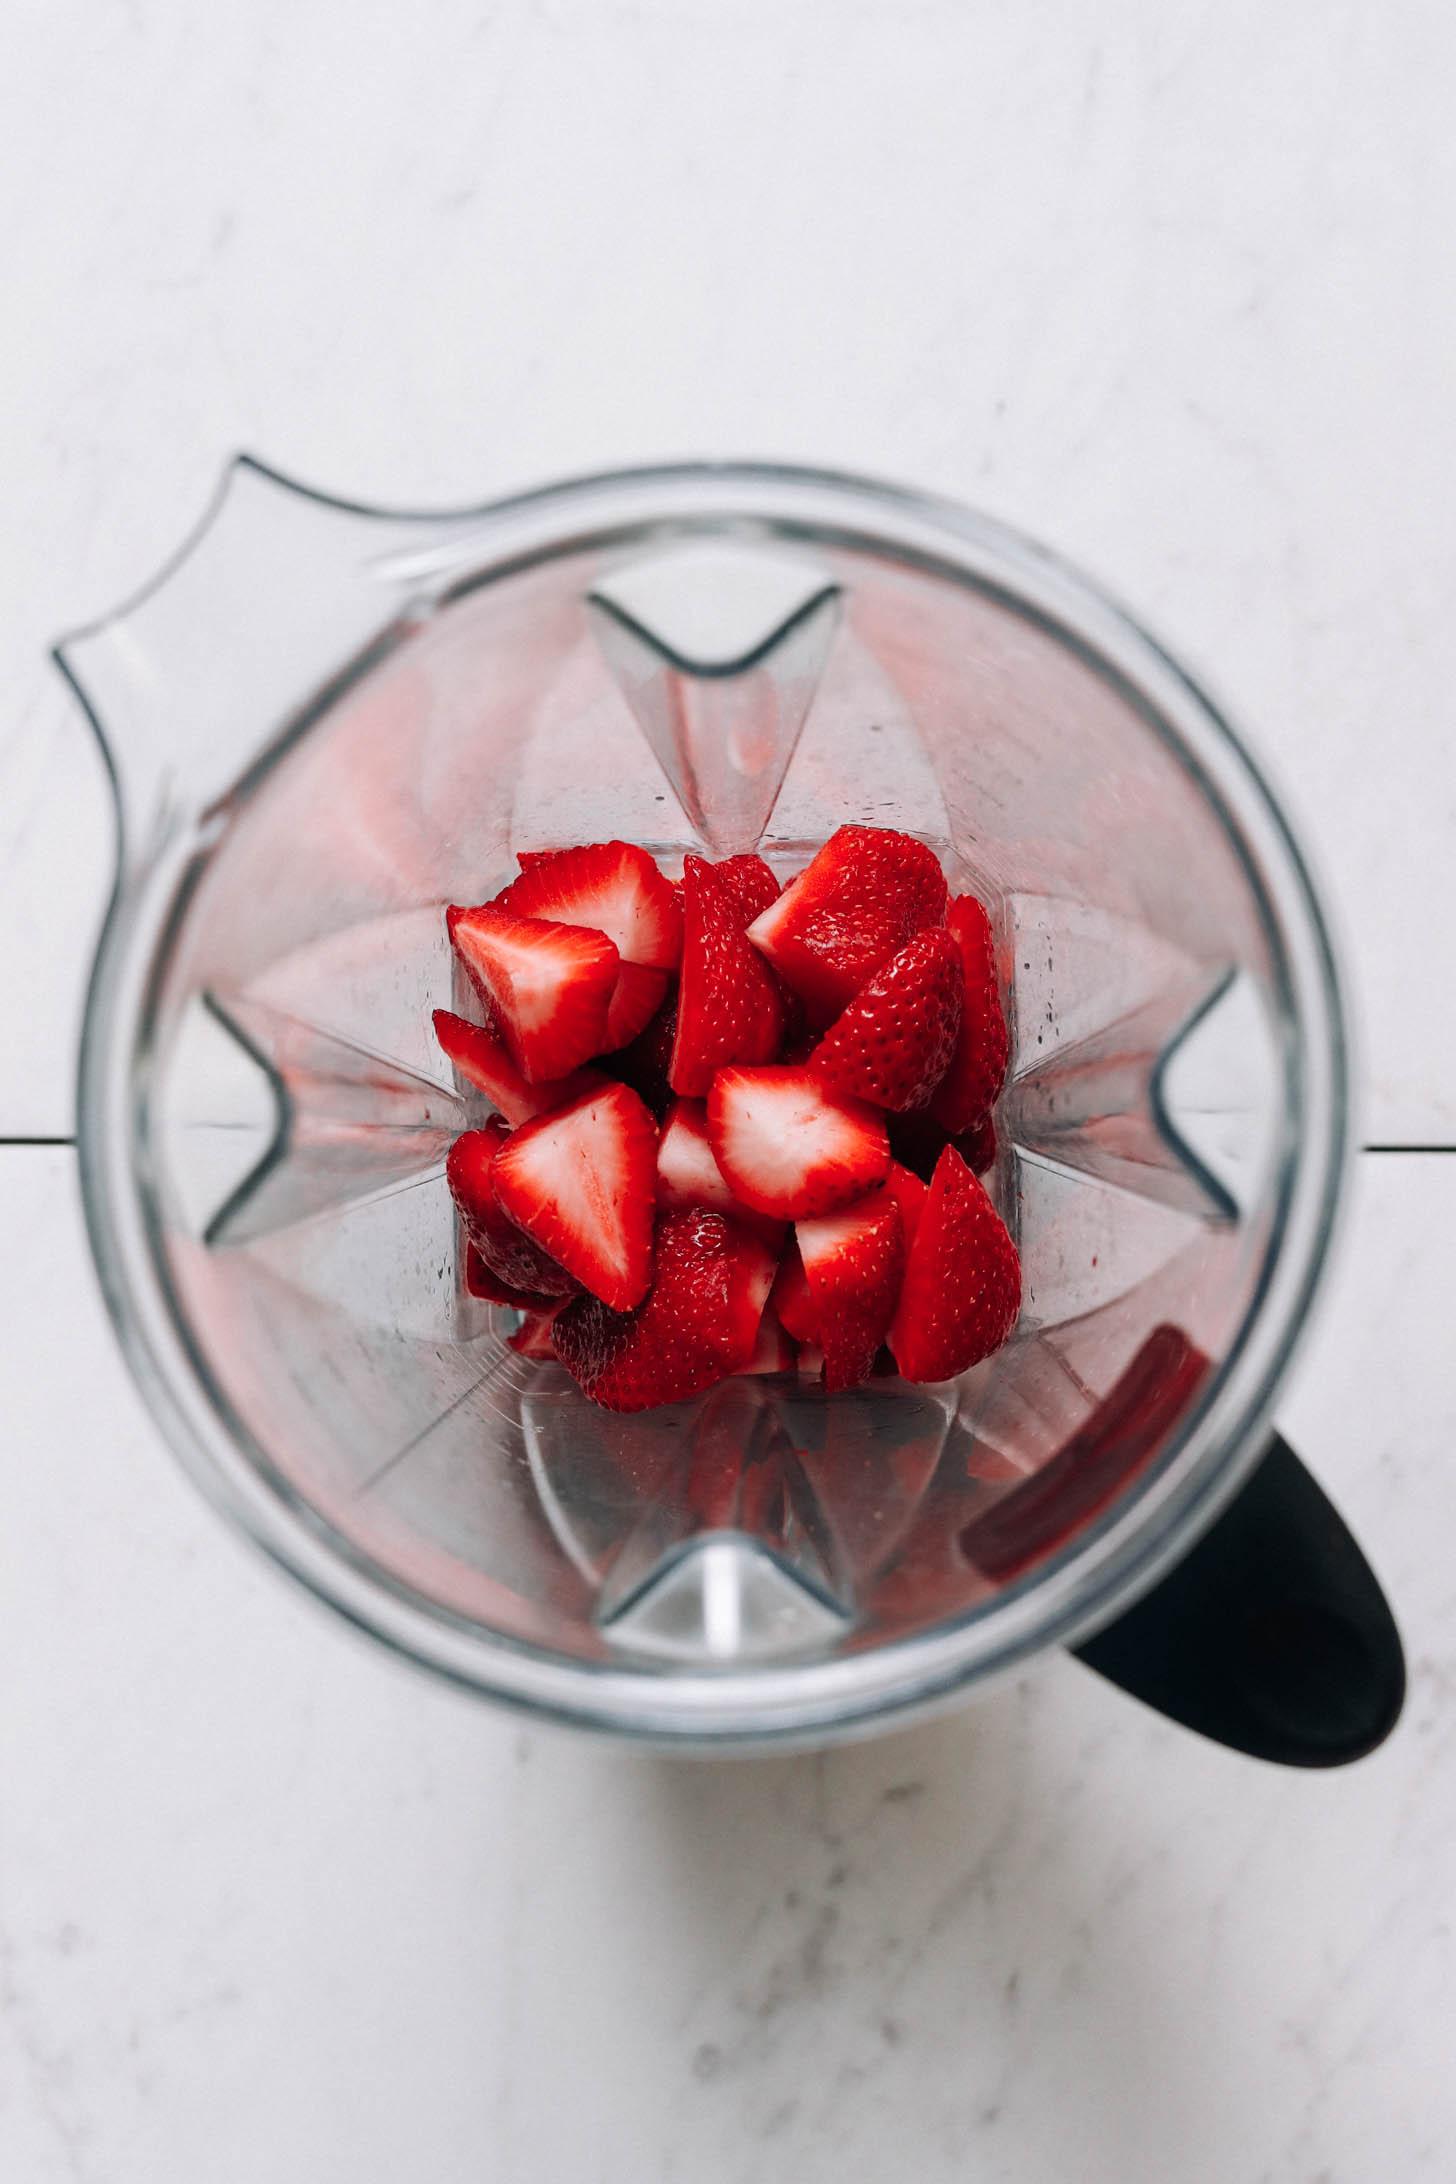 Blender with fresh strawberries